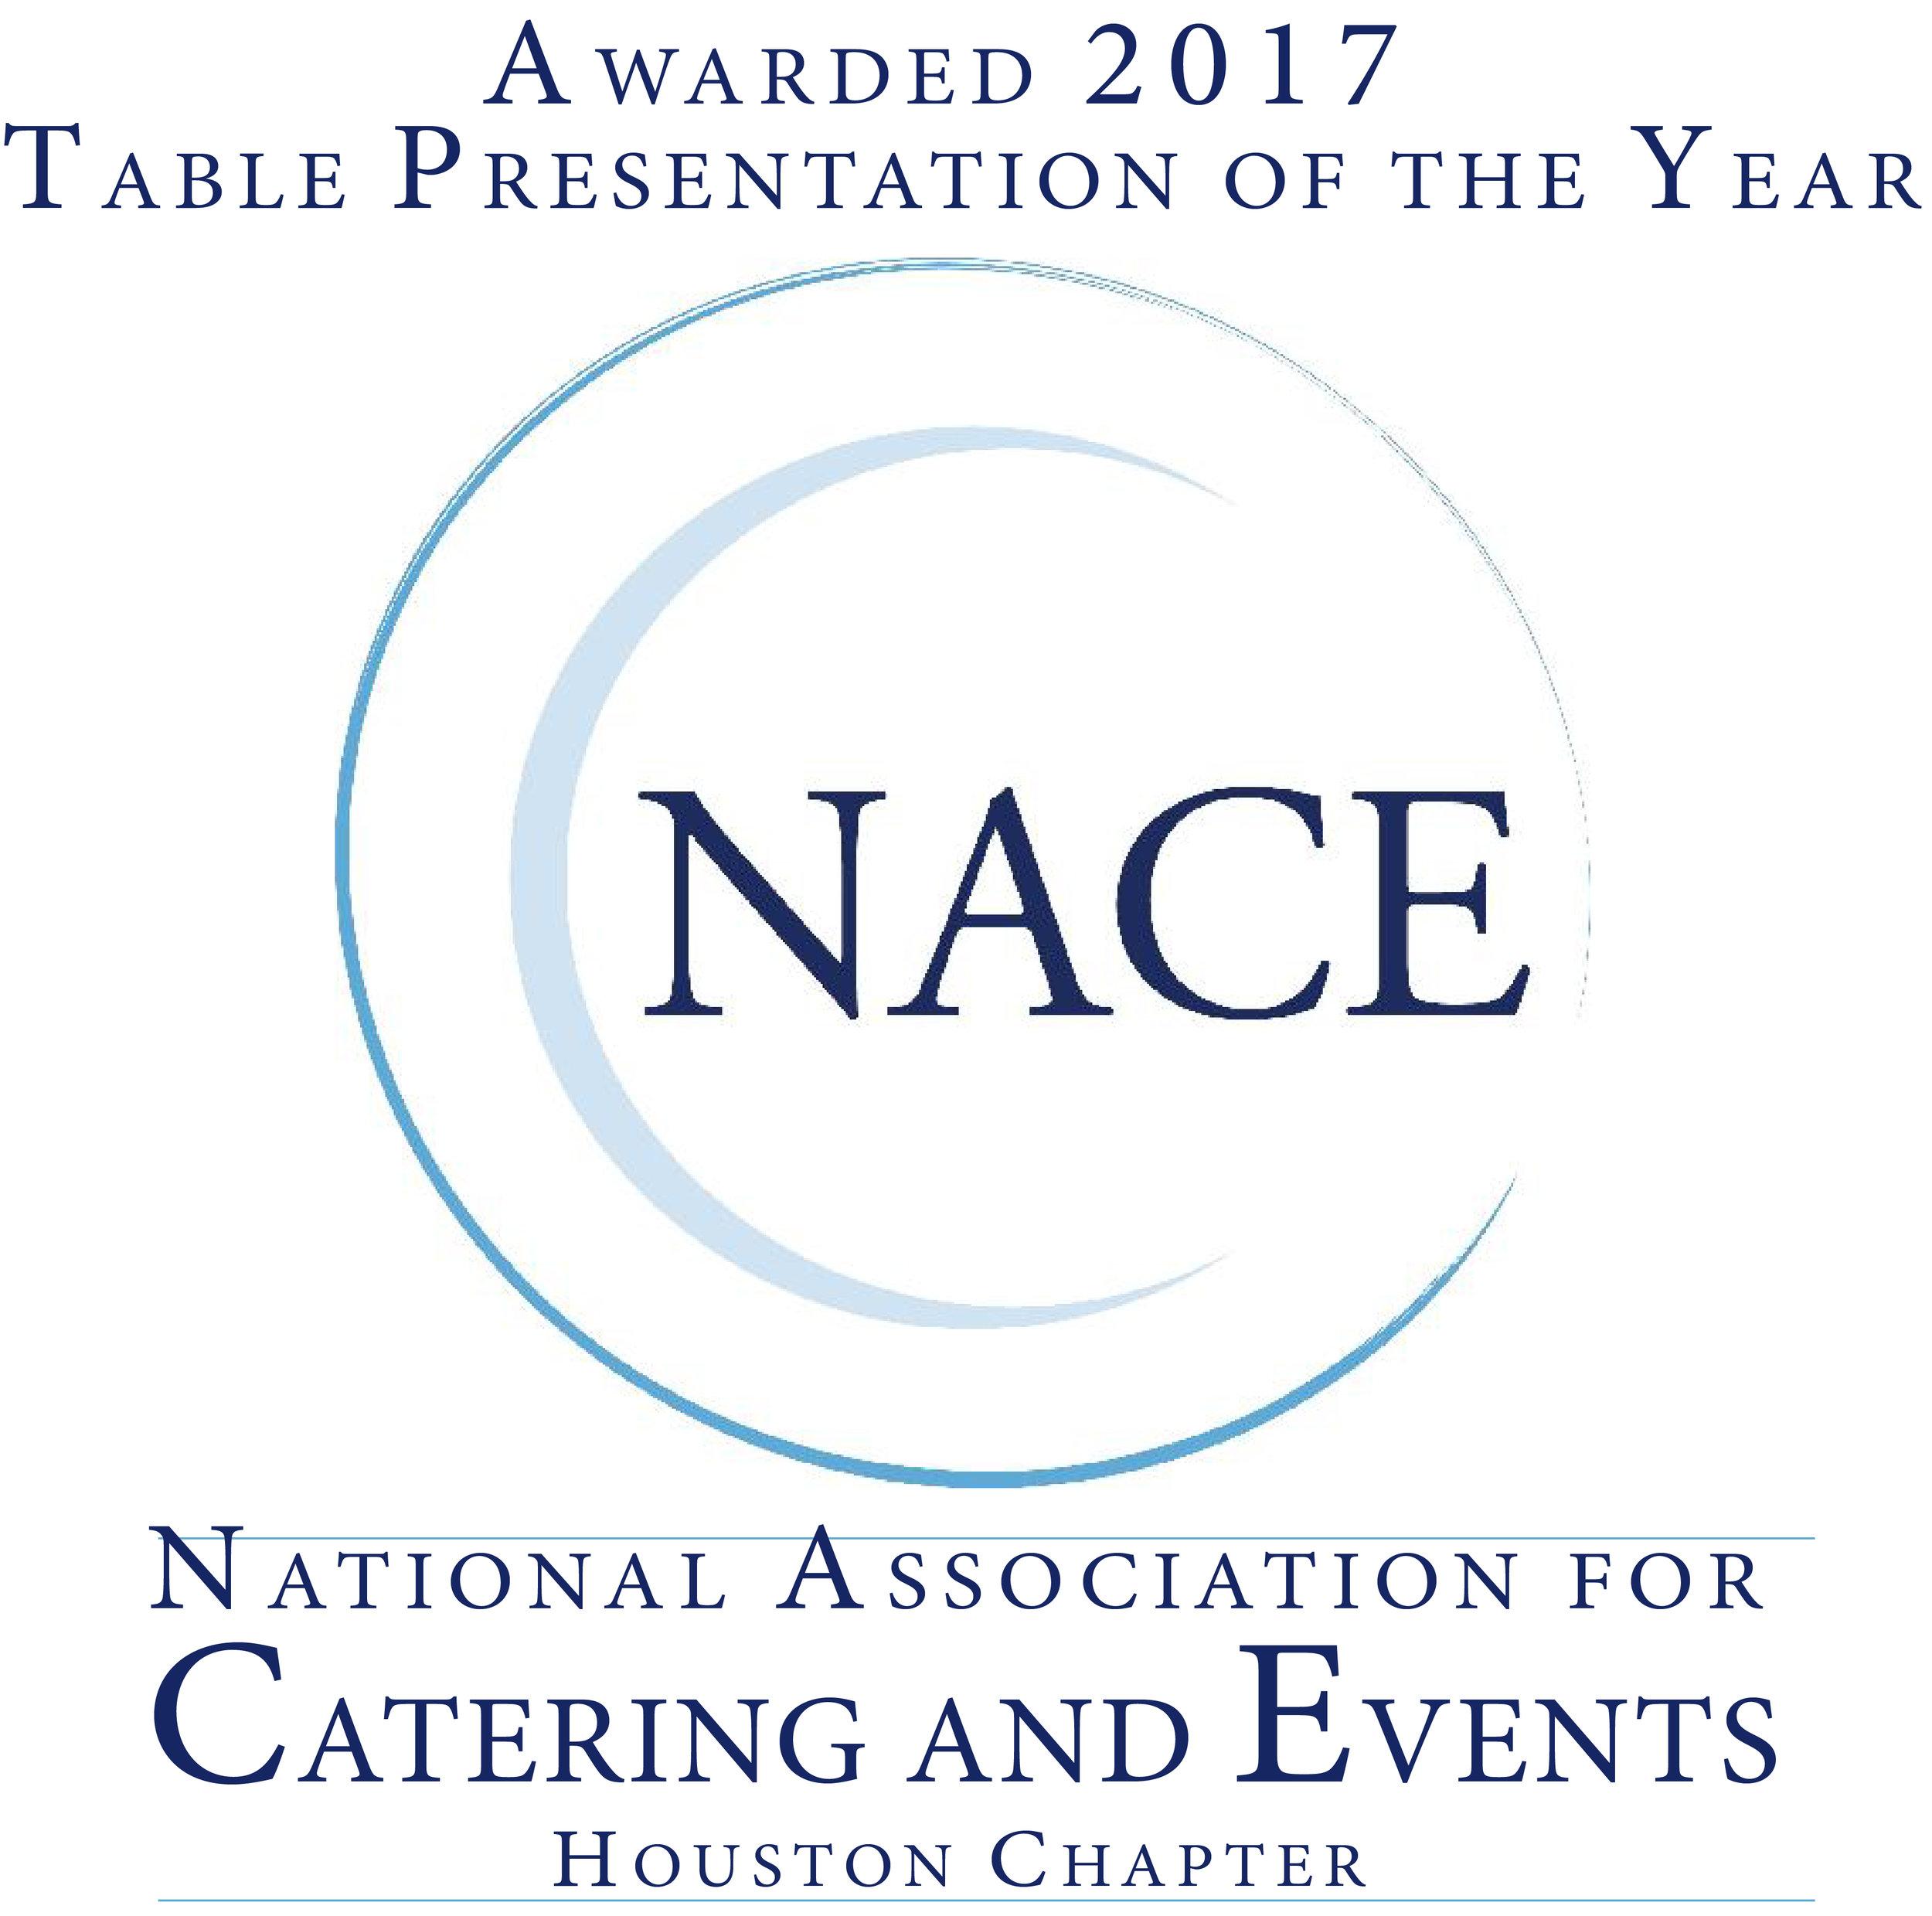 NACE Logo_Award Winner_Wedding_2017.jpg